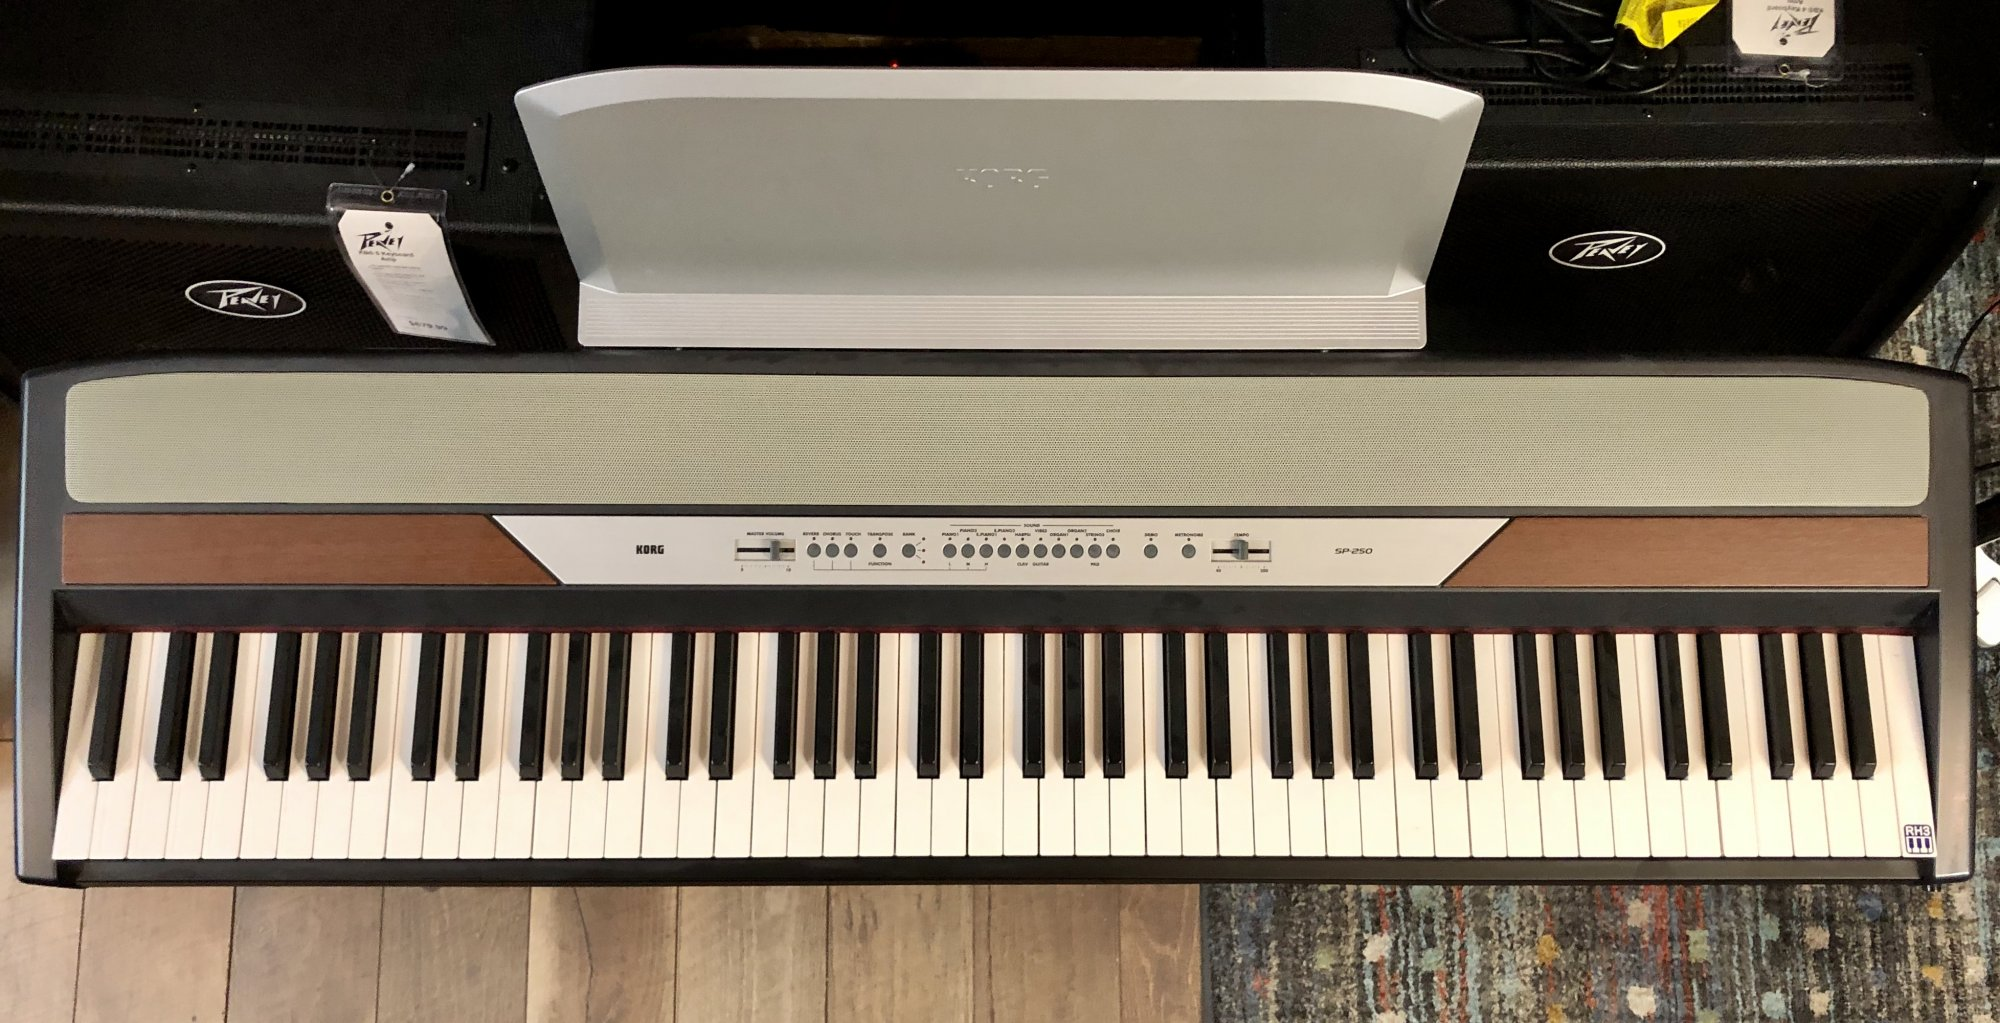 USED - Korg SP-250 Keyboard Digital Piano